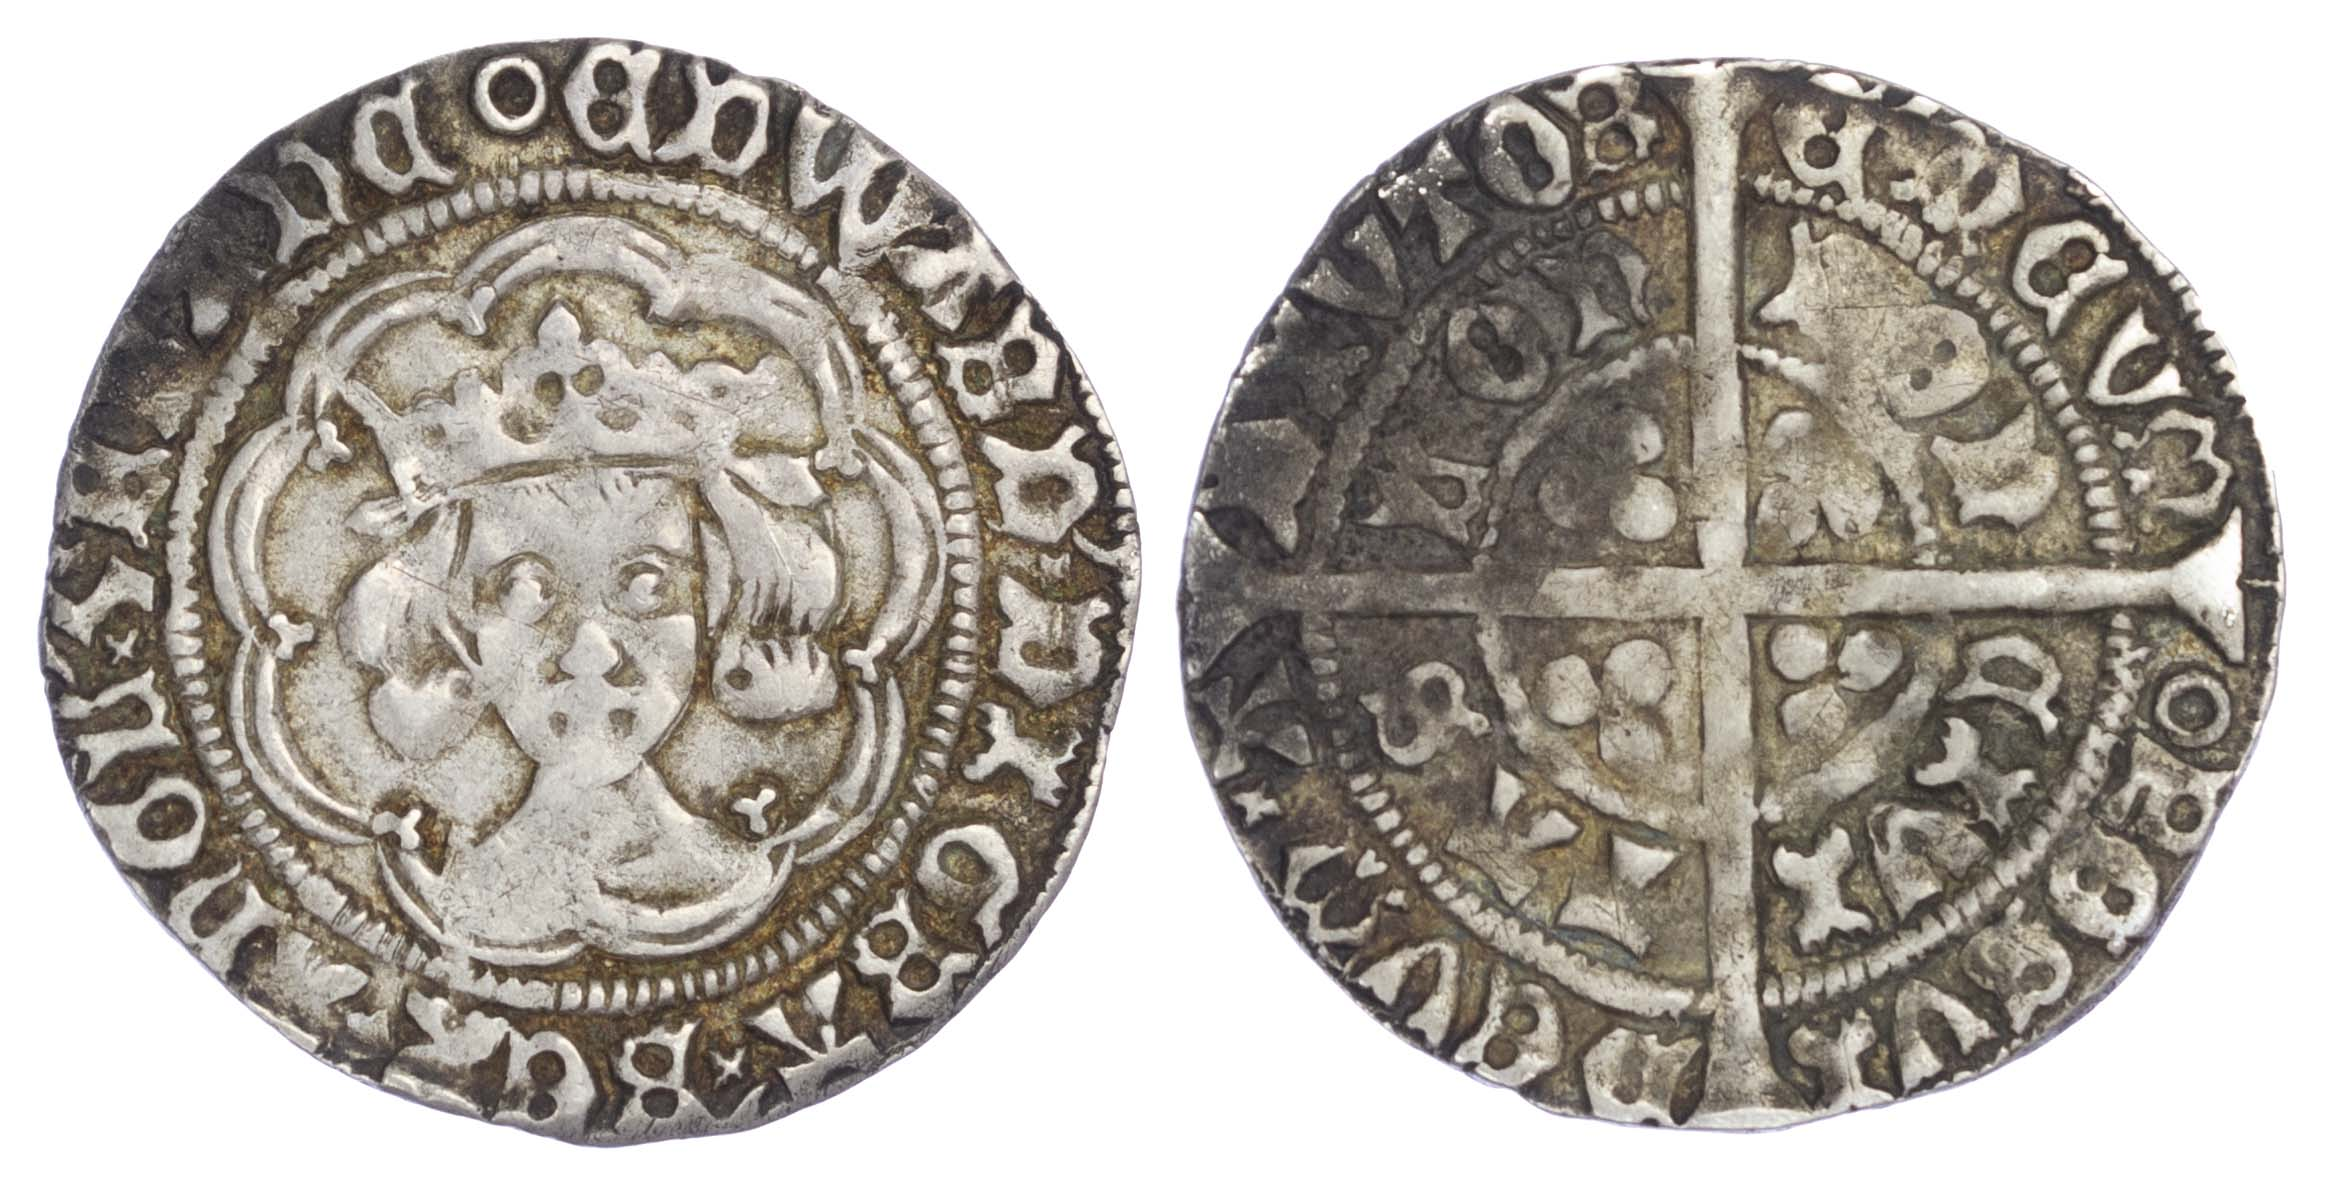 Edward IV (1471-1483), Second reign, Groat, London mint